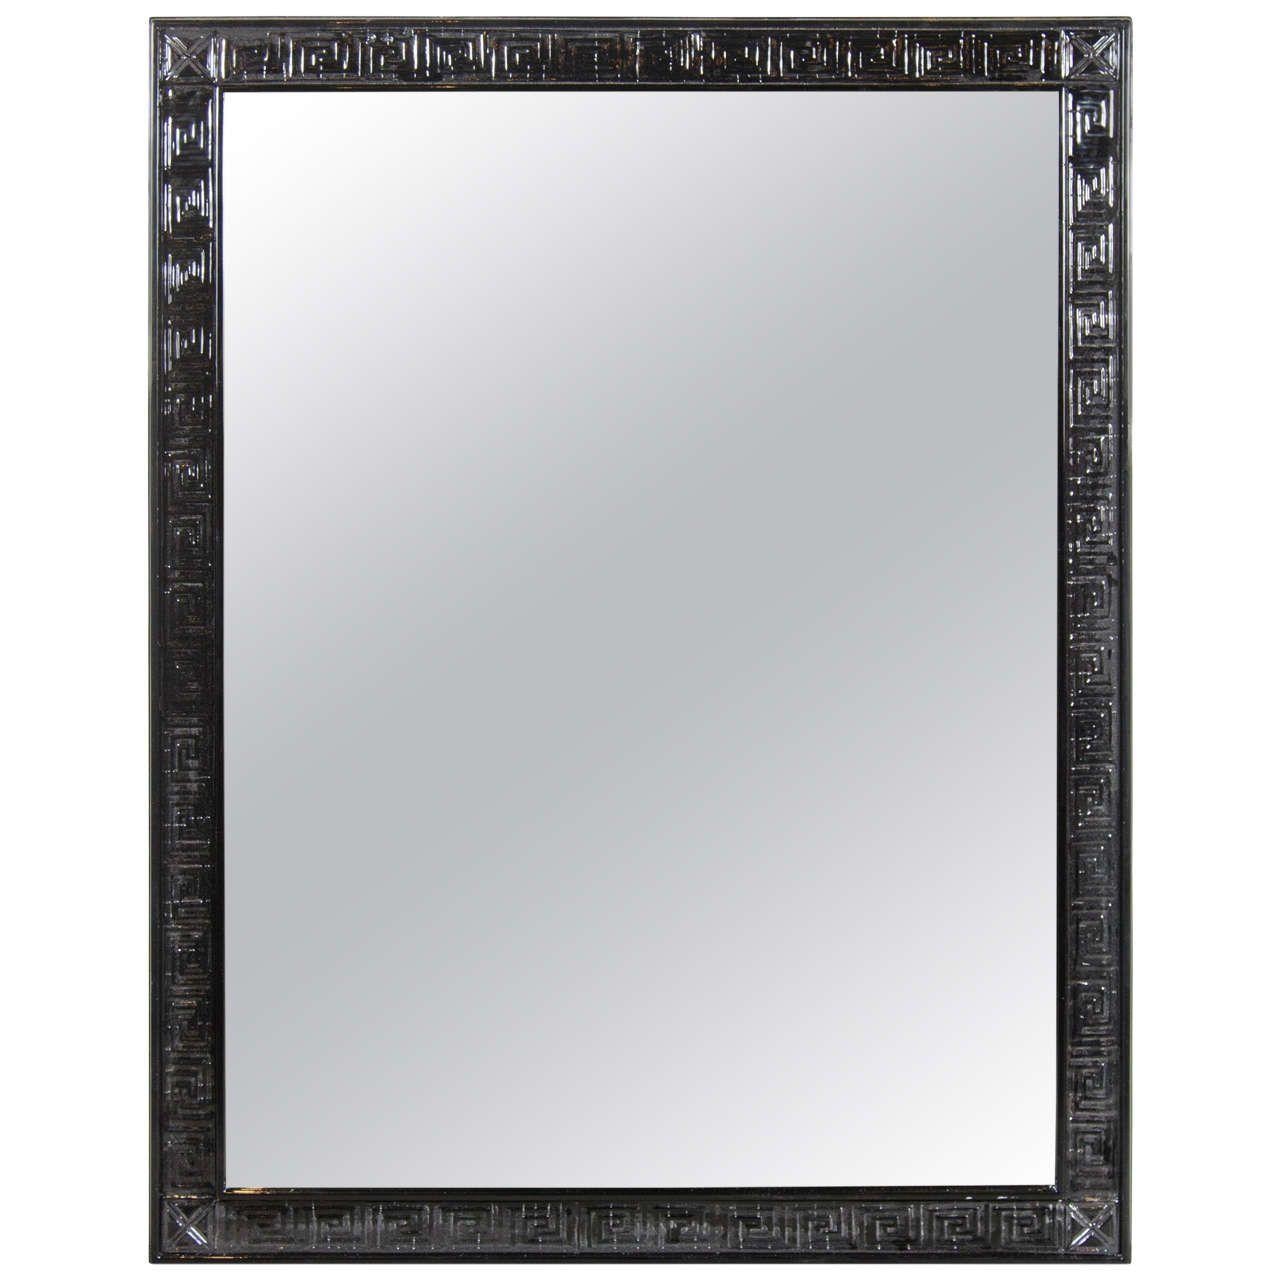 Mid century modern mirror w greek key border in ebonized walnut mid century modern mirror w greek key border in ebonized walnut jeuxipadfo Choice Image